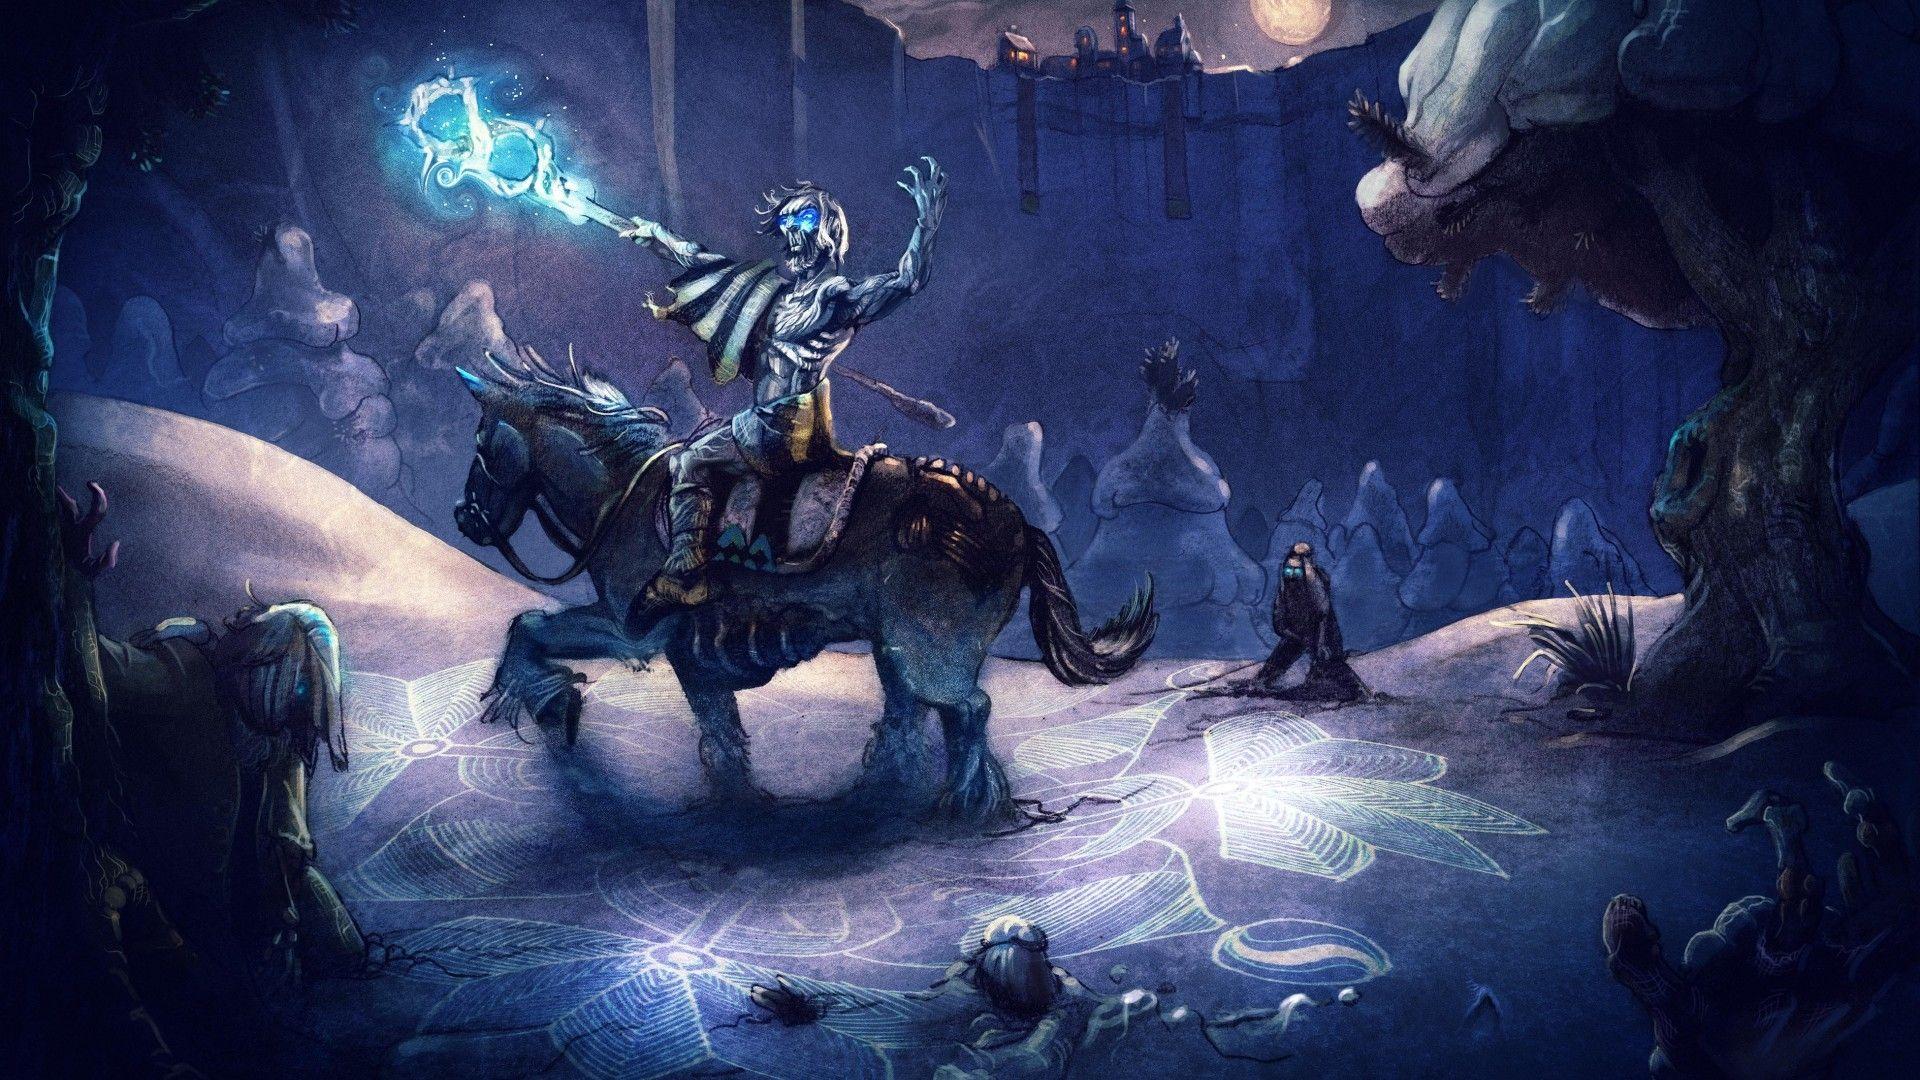 Game of Thrones white walker on horse